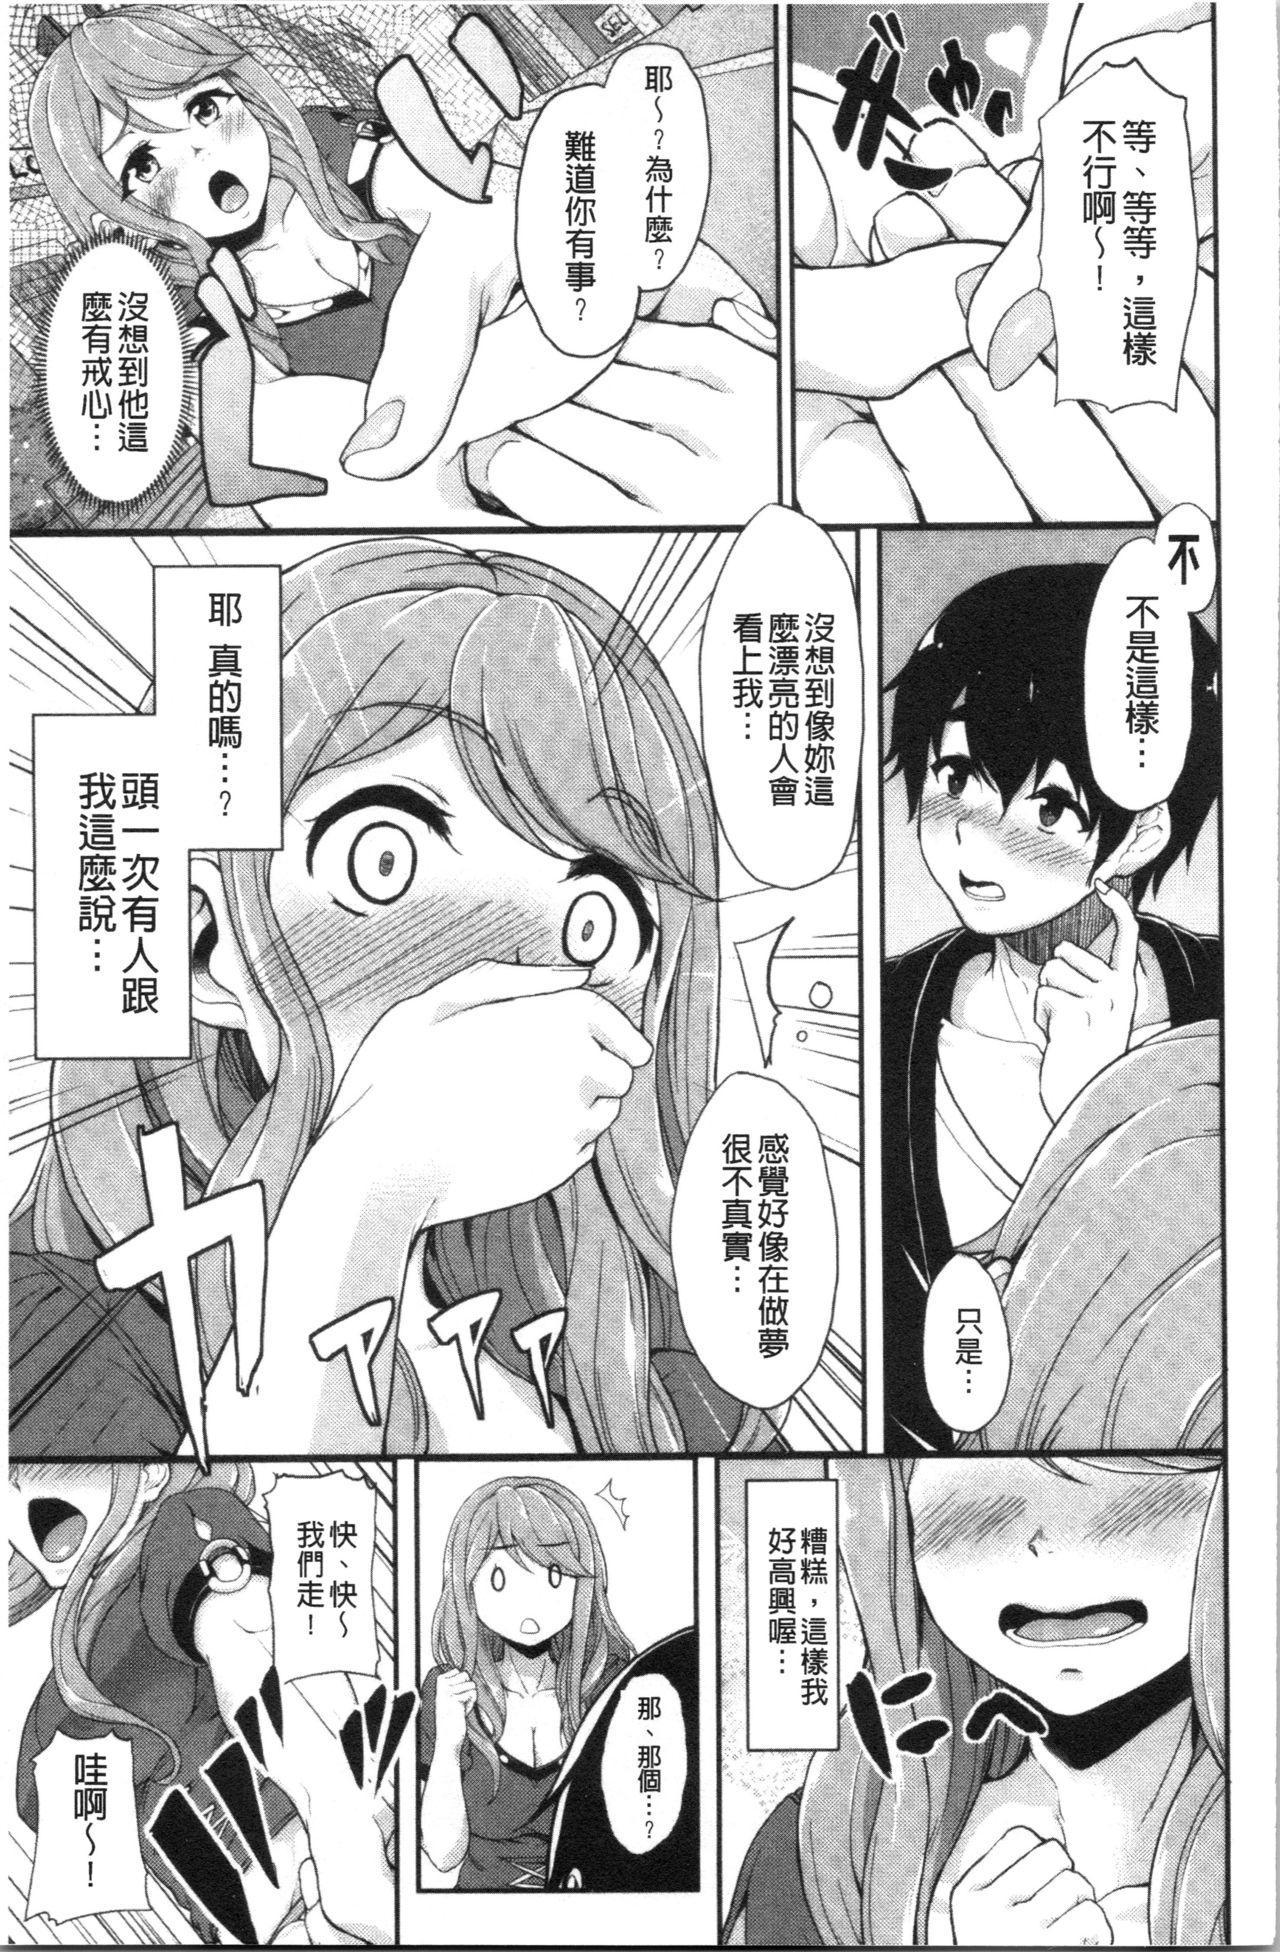 Kanojo ga SEX ni nare teru wake | 女友對激情性愛變很習慣的理由 157